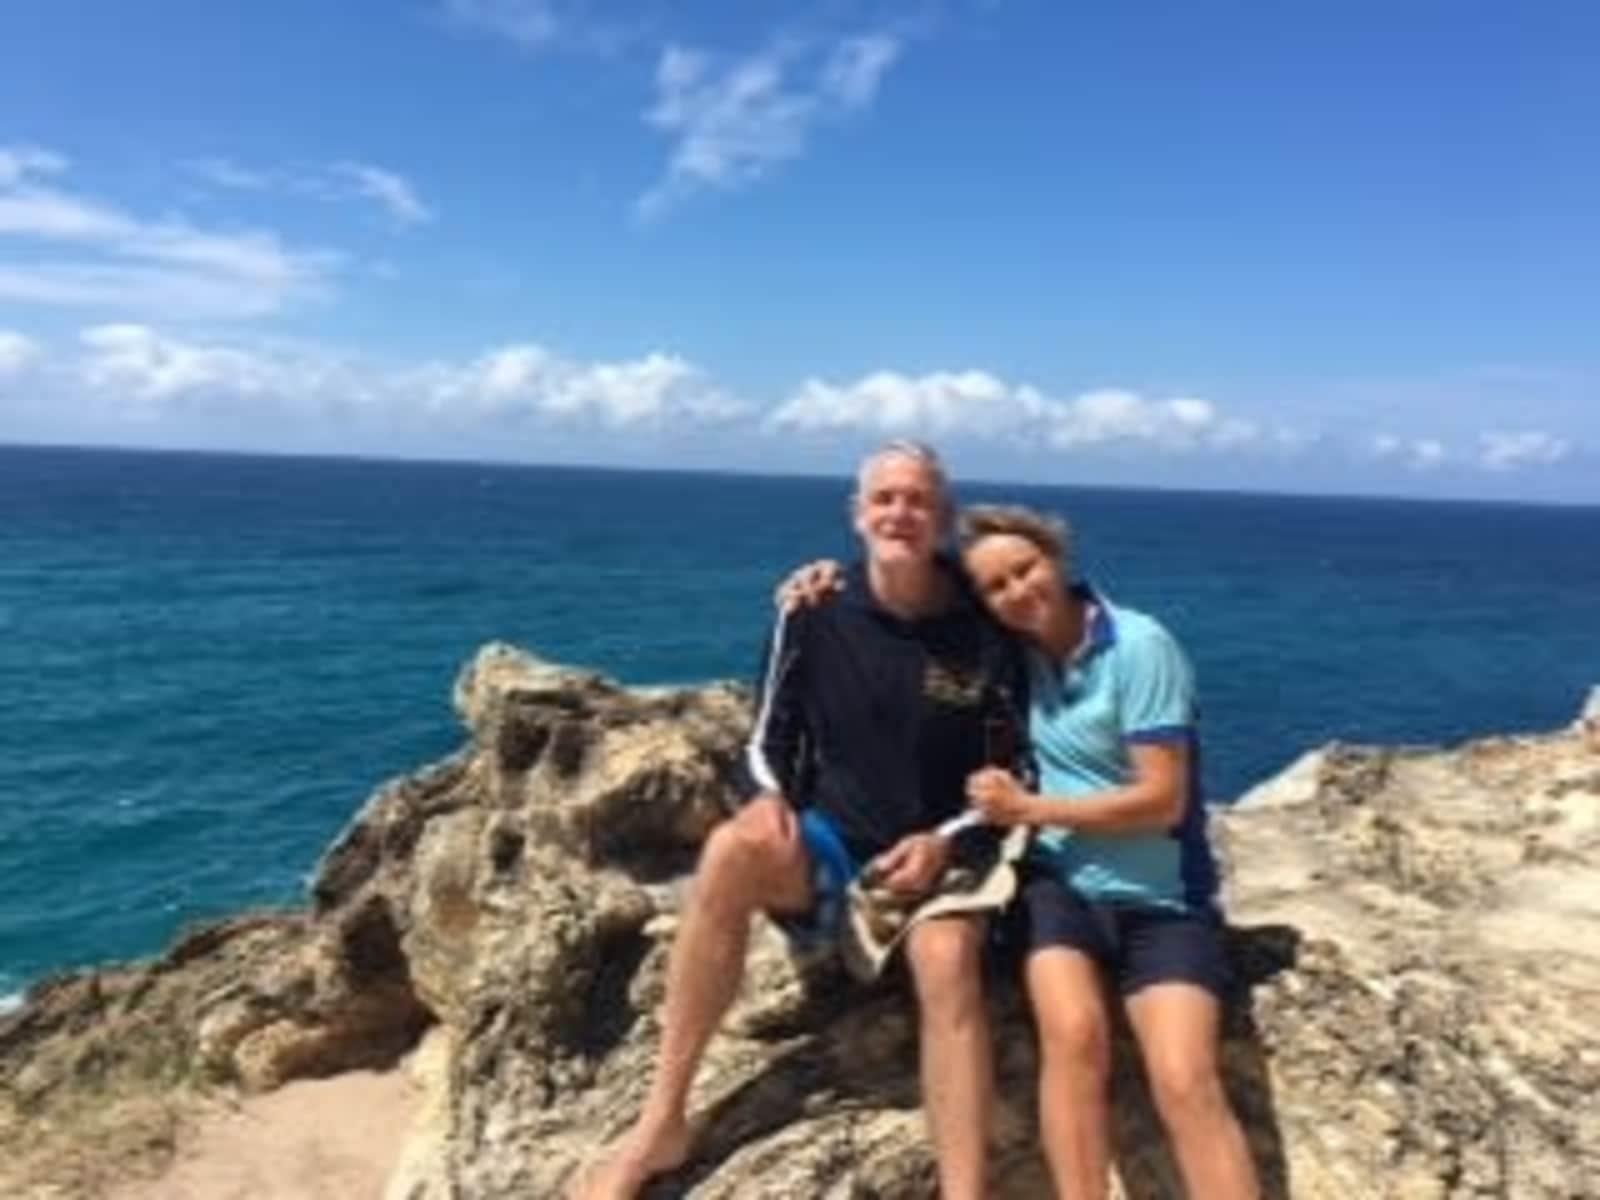 Ilse & Martin from Gold Coast, Queensland, Australia